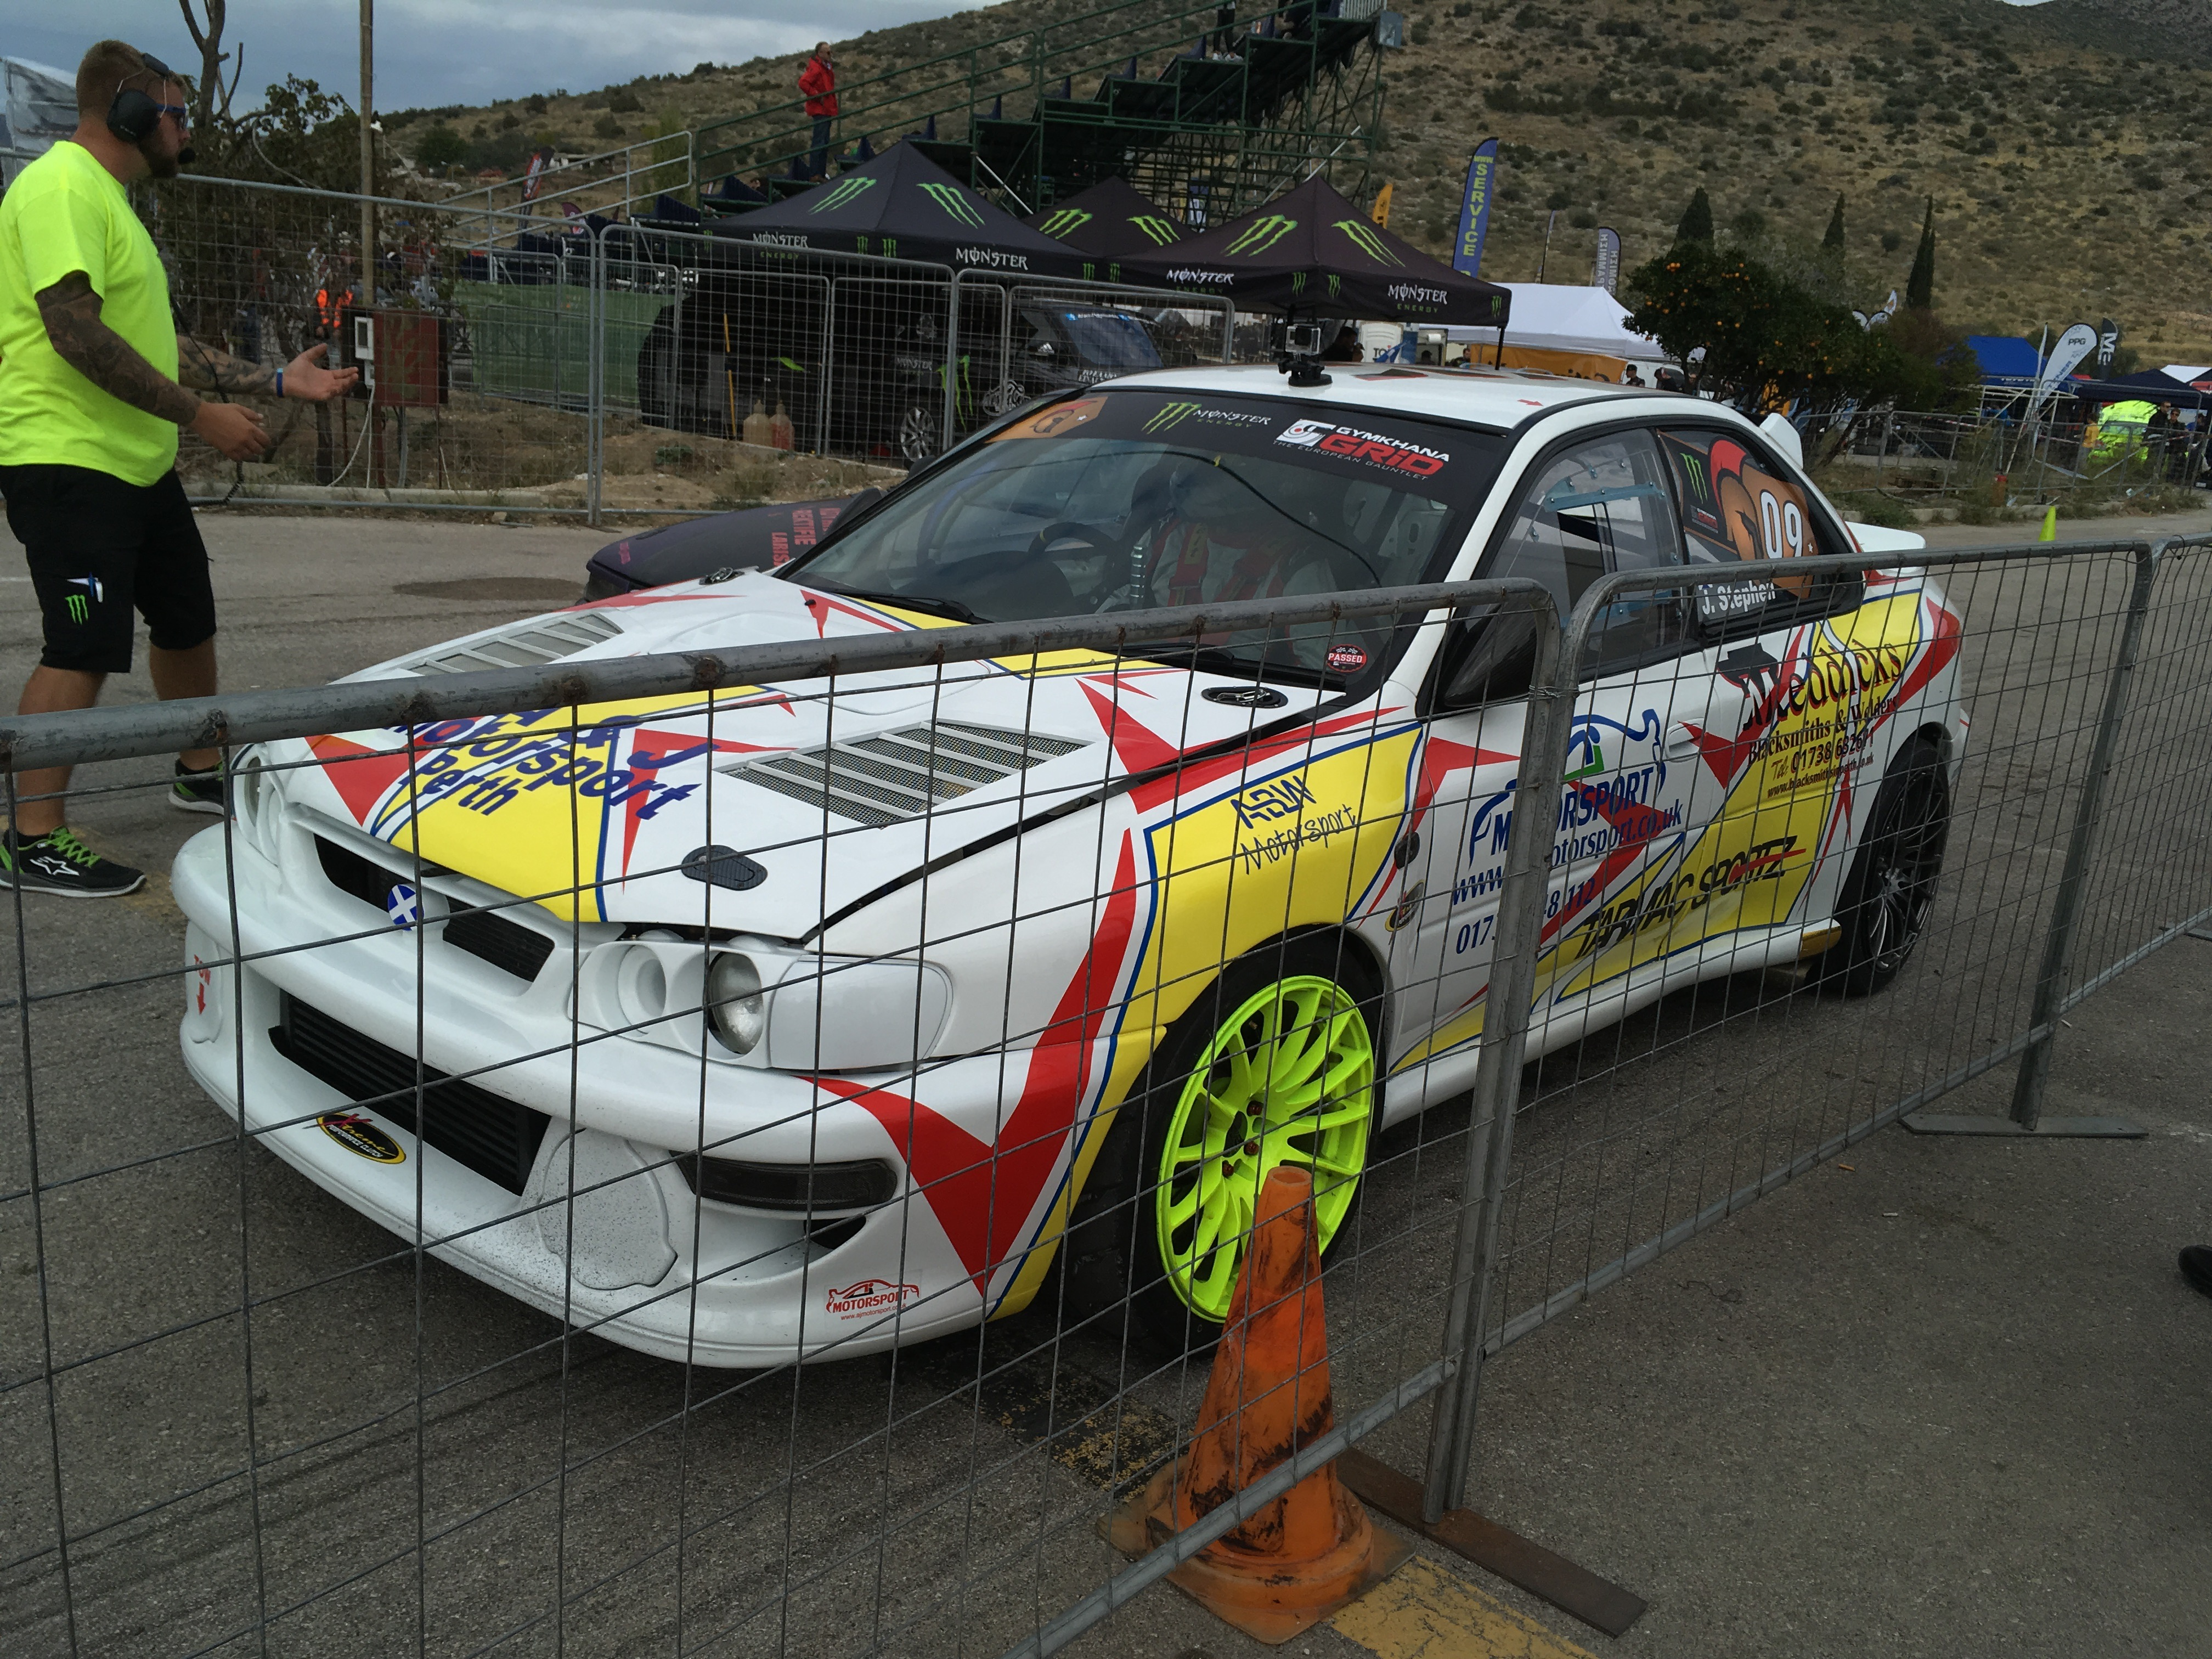 My Good Friendu0027s James Stephenu0027s Subaru Impreza WRX STI 22B At Gymkhana  Grid!! I Was Officially Invited By Monster Energy!!